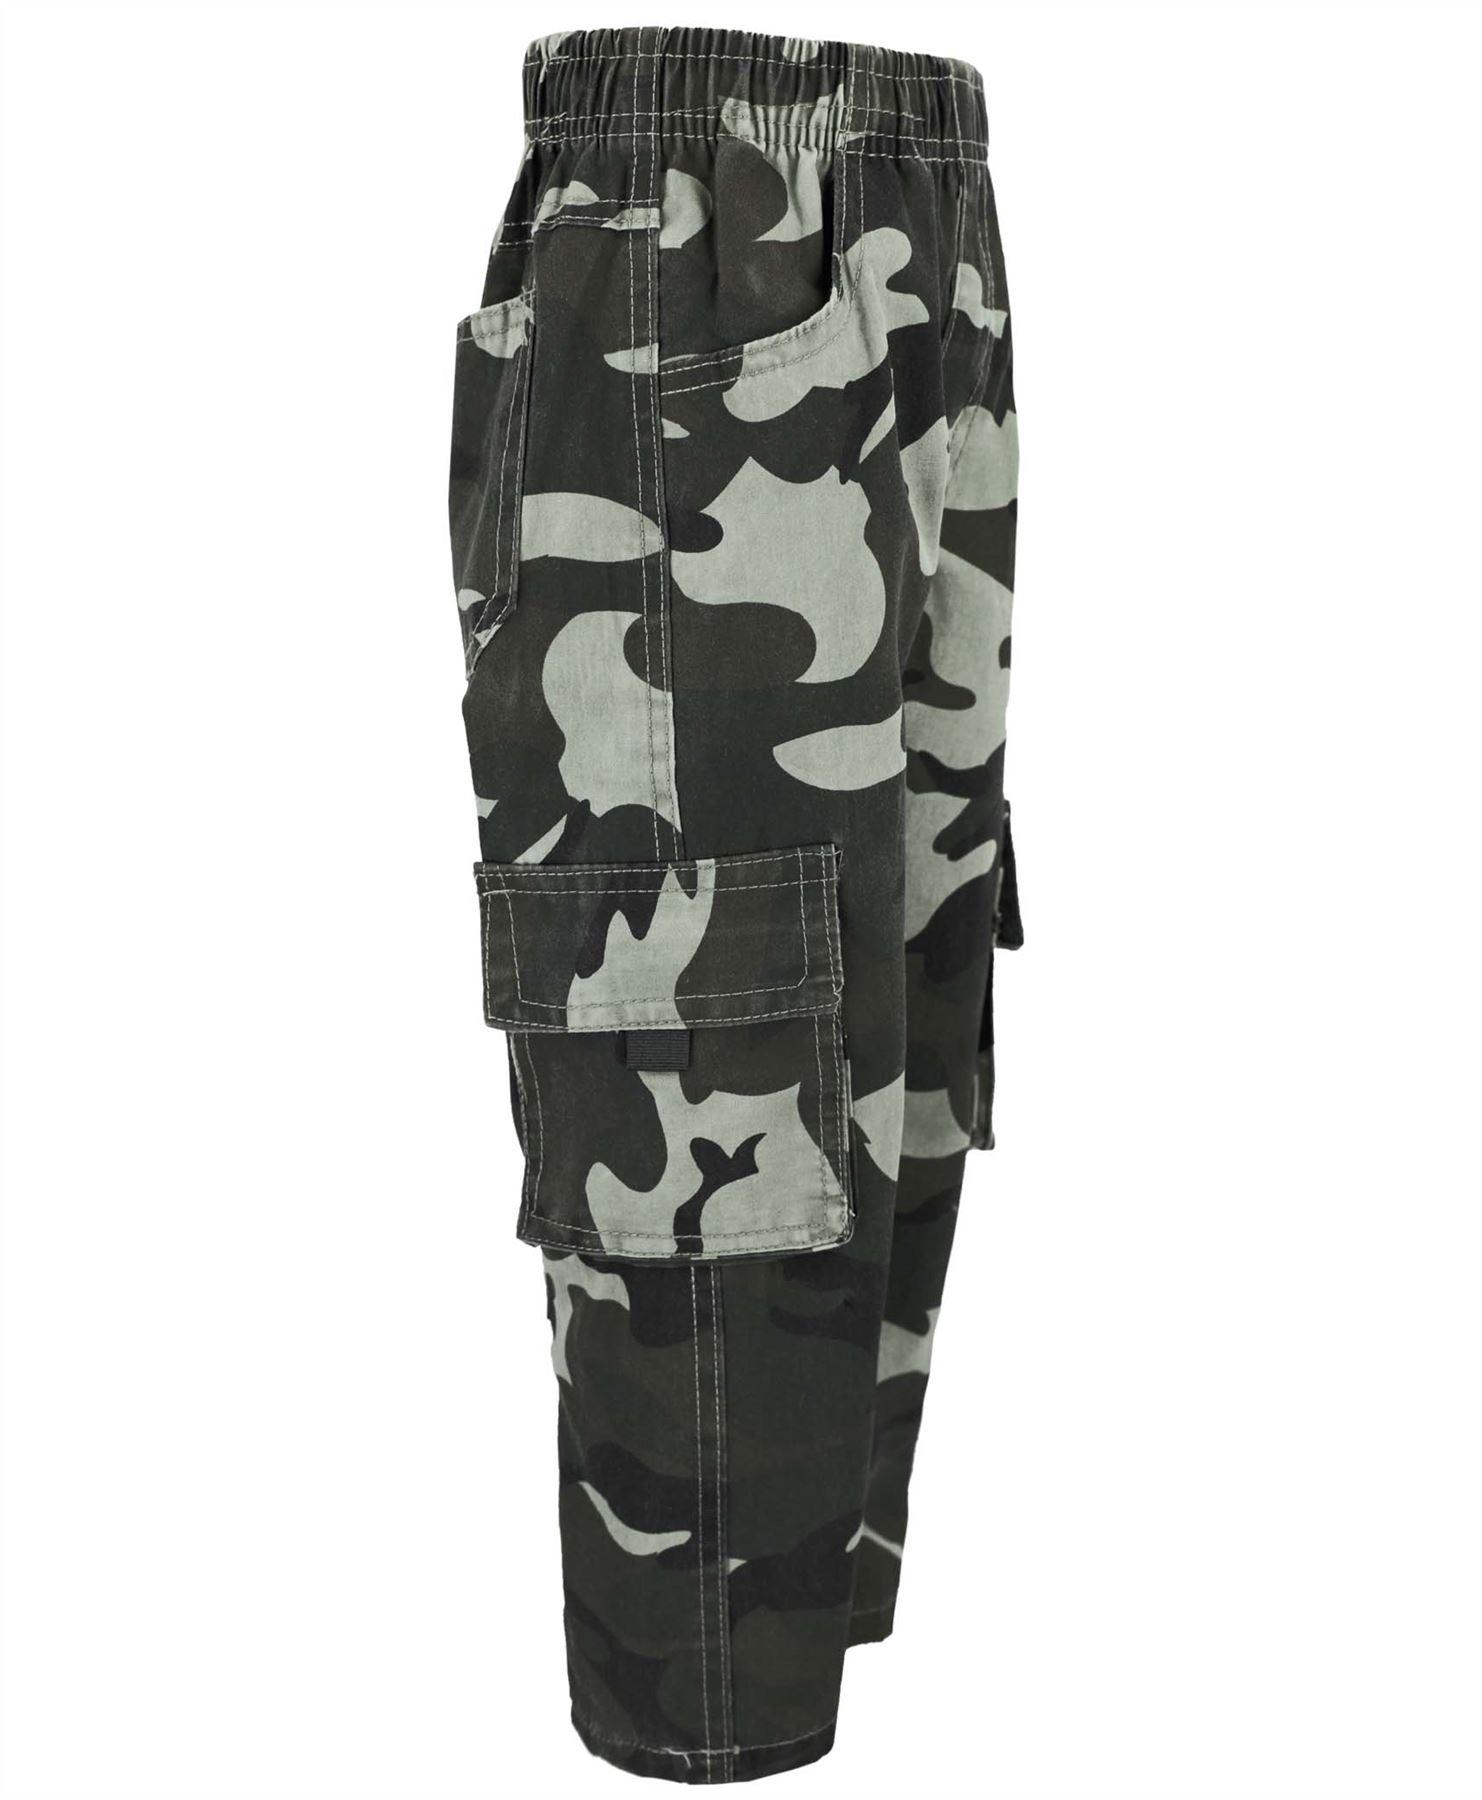 Kids-multipocket-camouflage-pantalon-garcons-armee-imprimer-cargo-combat-pantalon-4-14-ans miniature 3